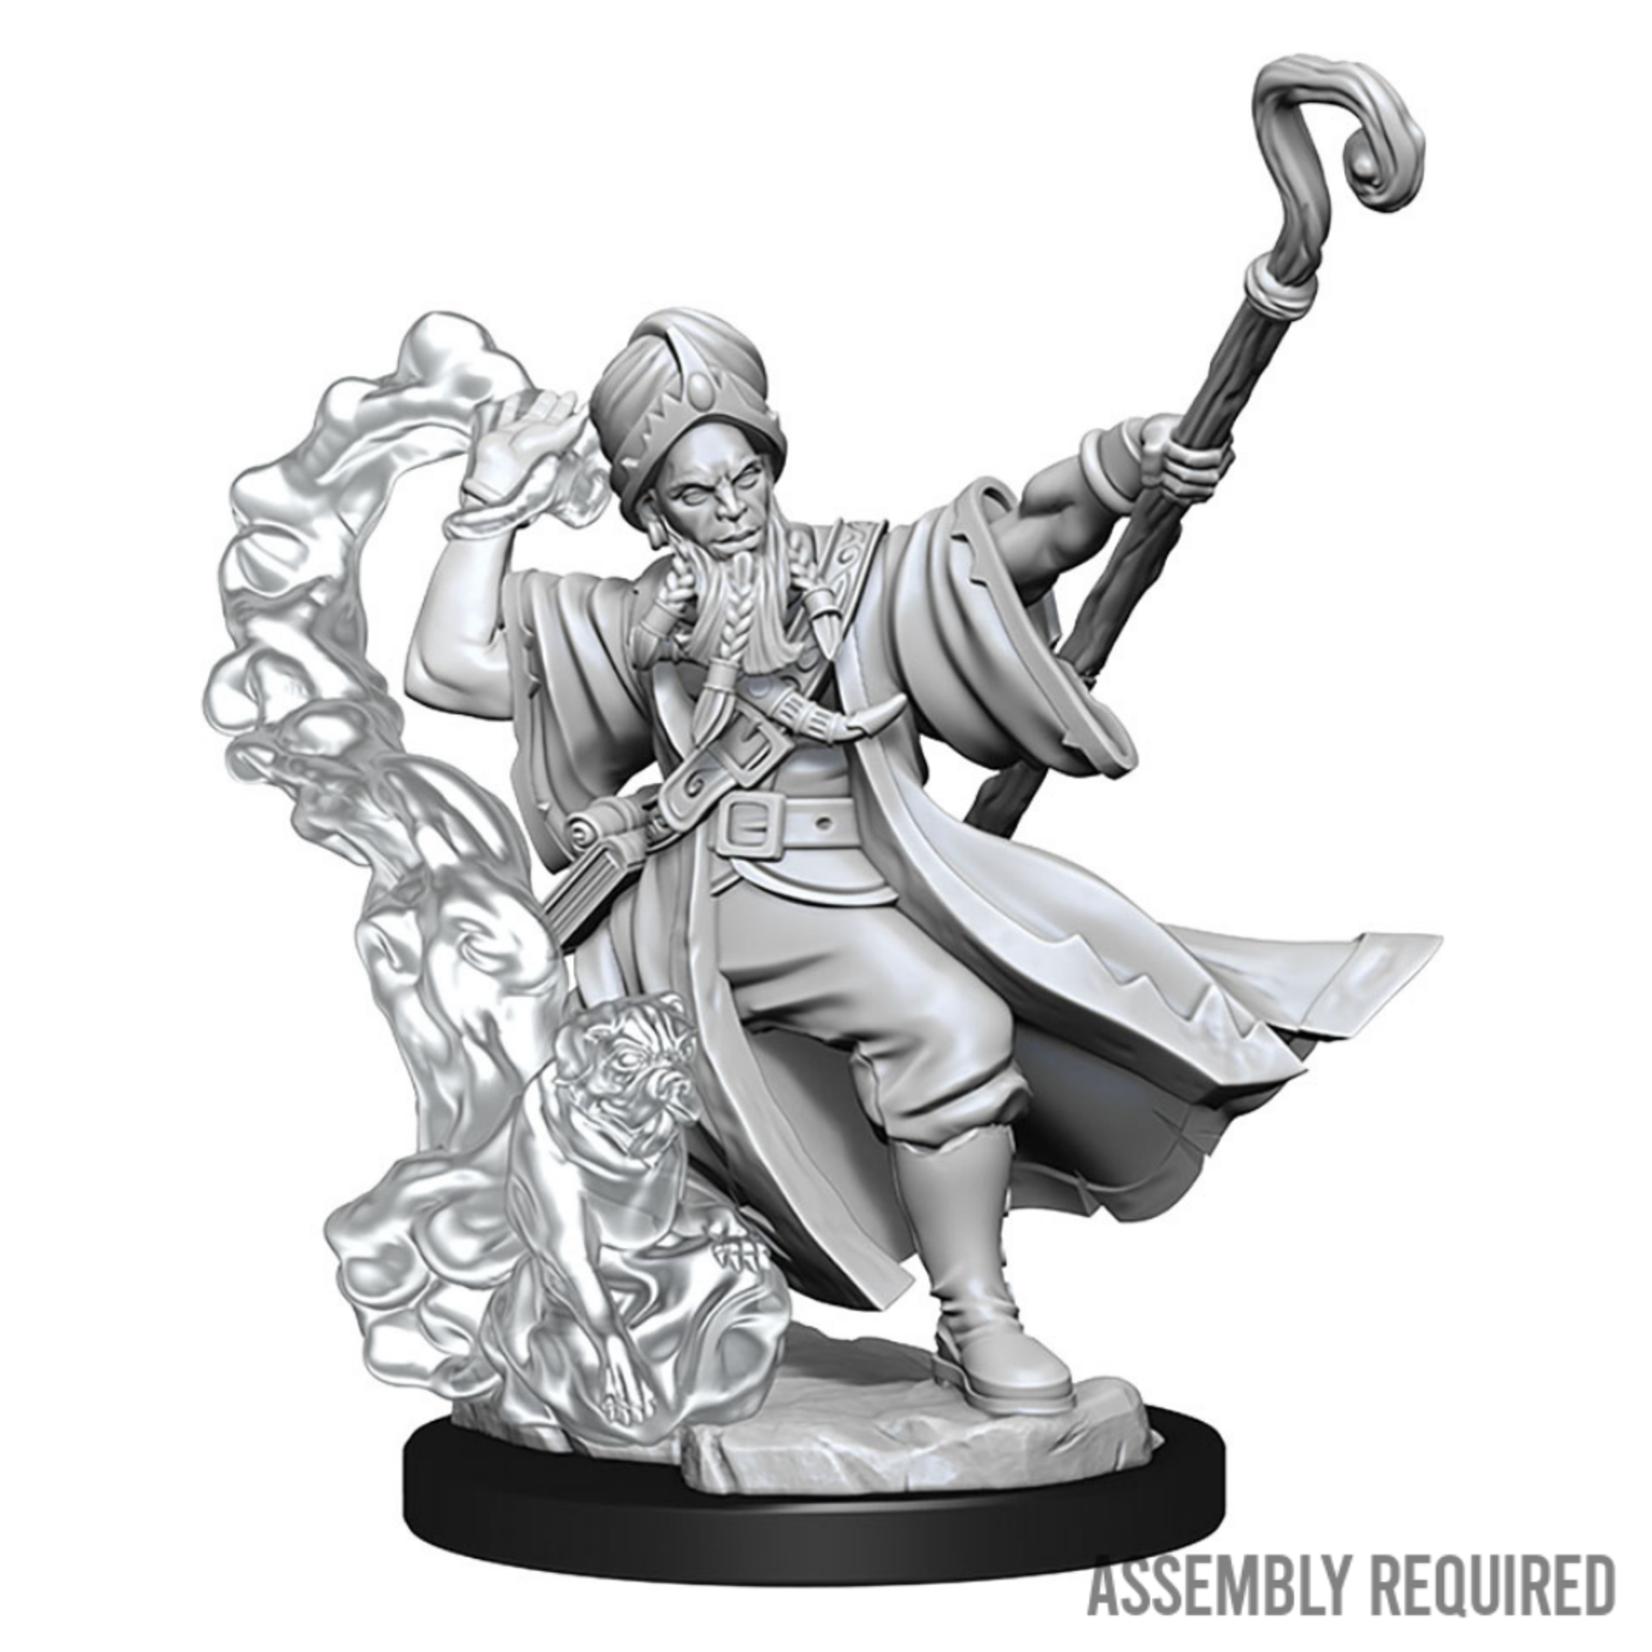 WizKids Wizkids Dungeons and Dragons Frameworks: Human Wizard Male W01 (Preorder)